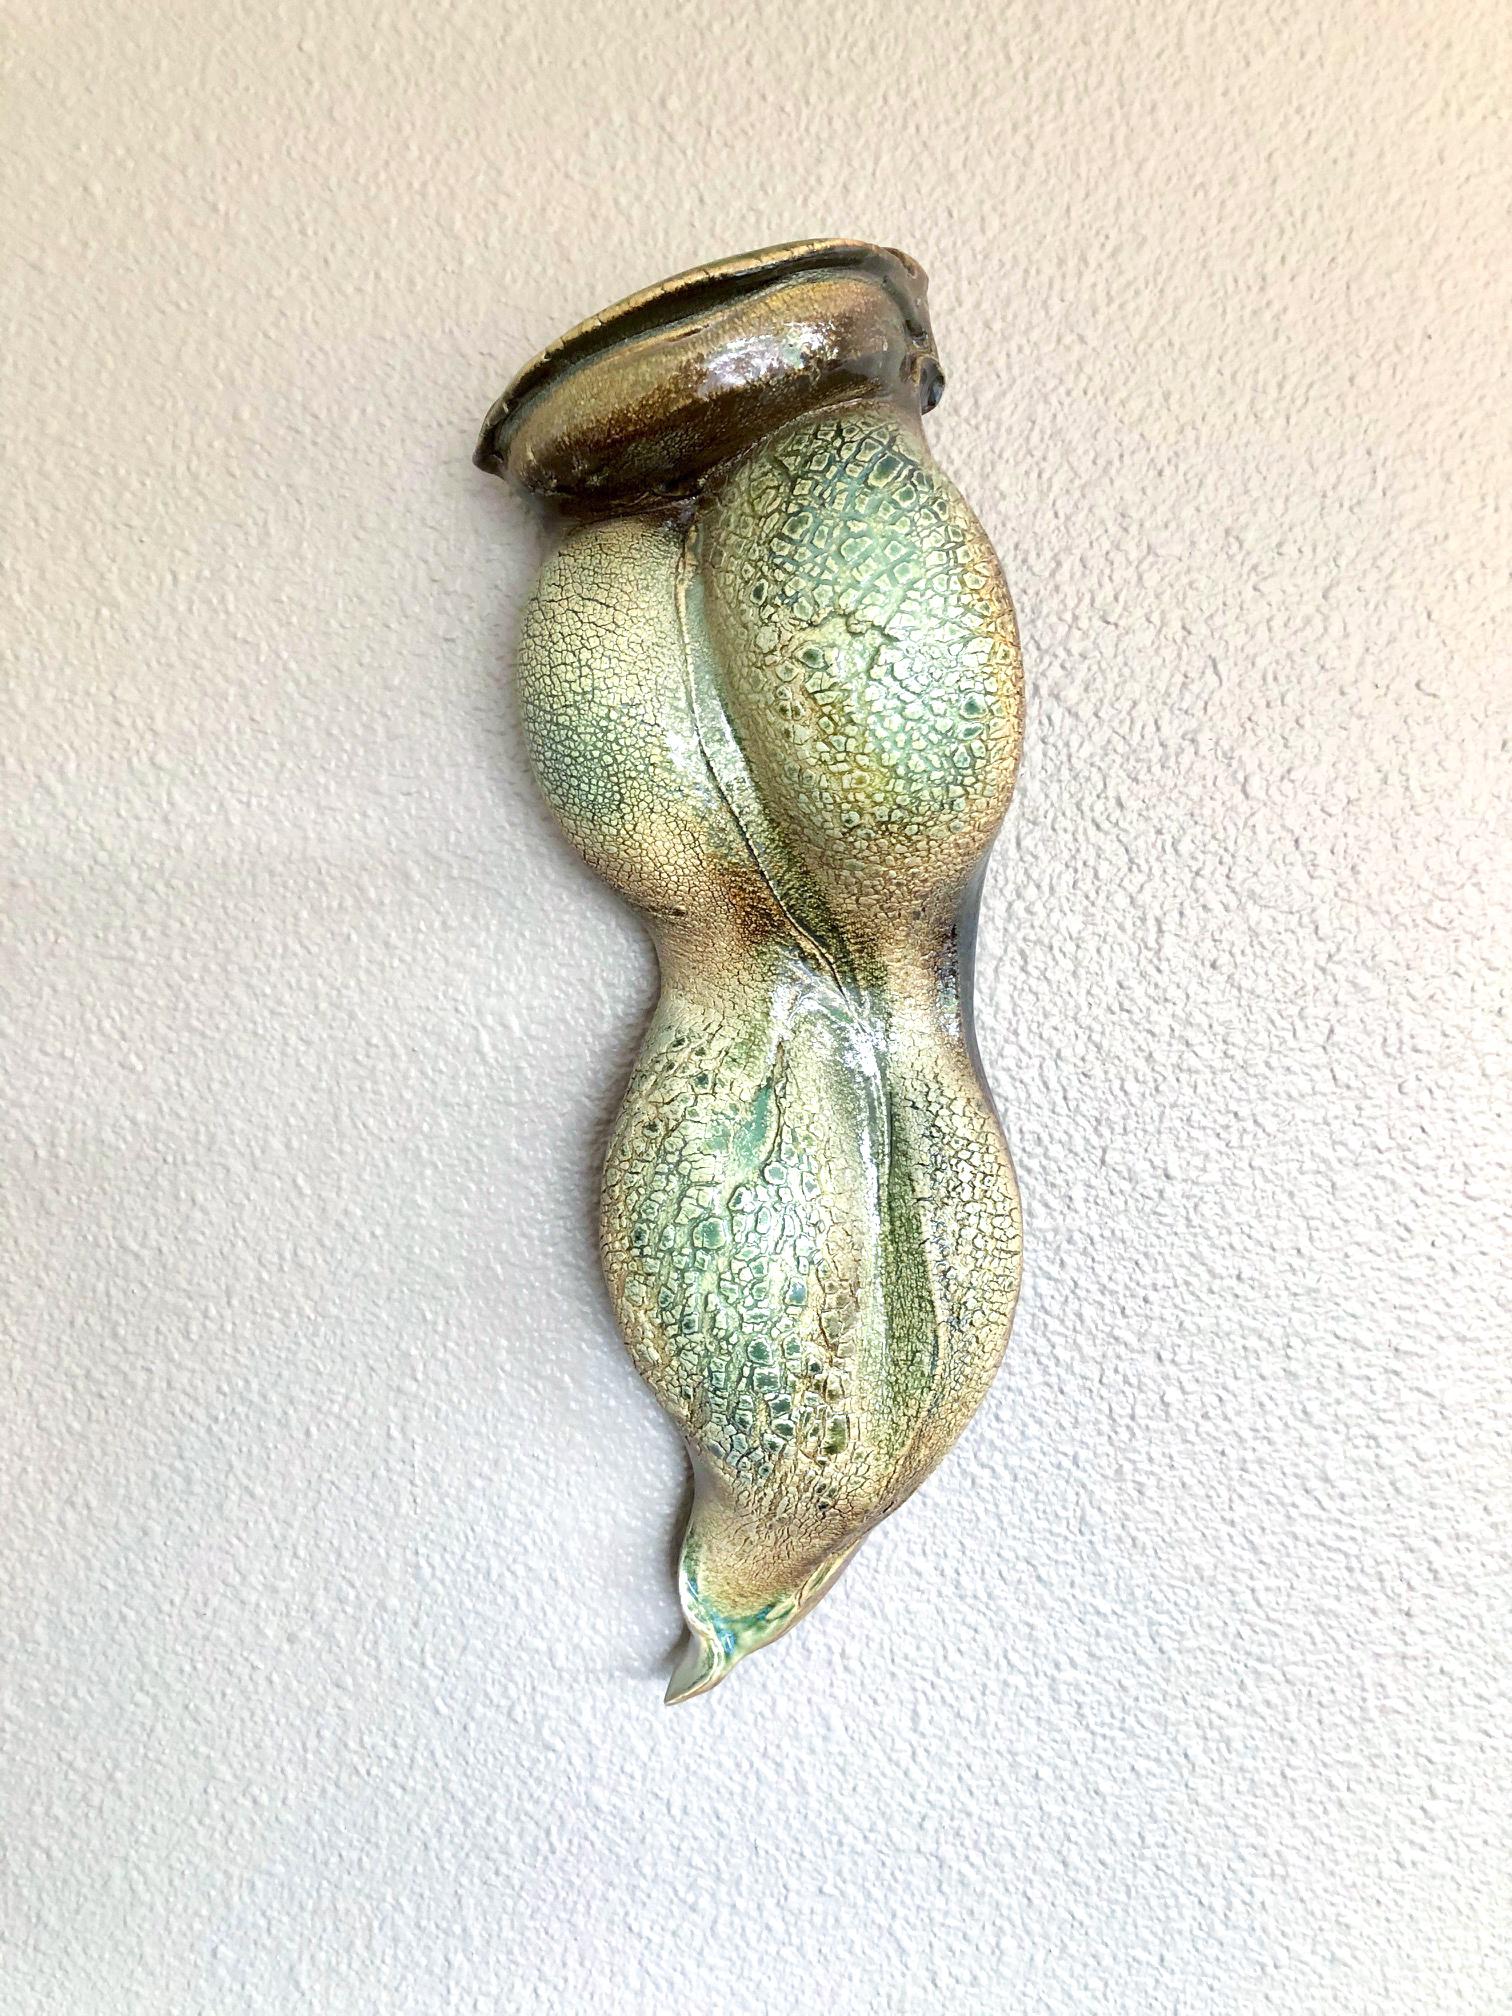 Moss Green Sconce - 16.75 x 5.5 x 3.5 - $225 - Stoneware